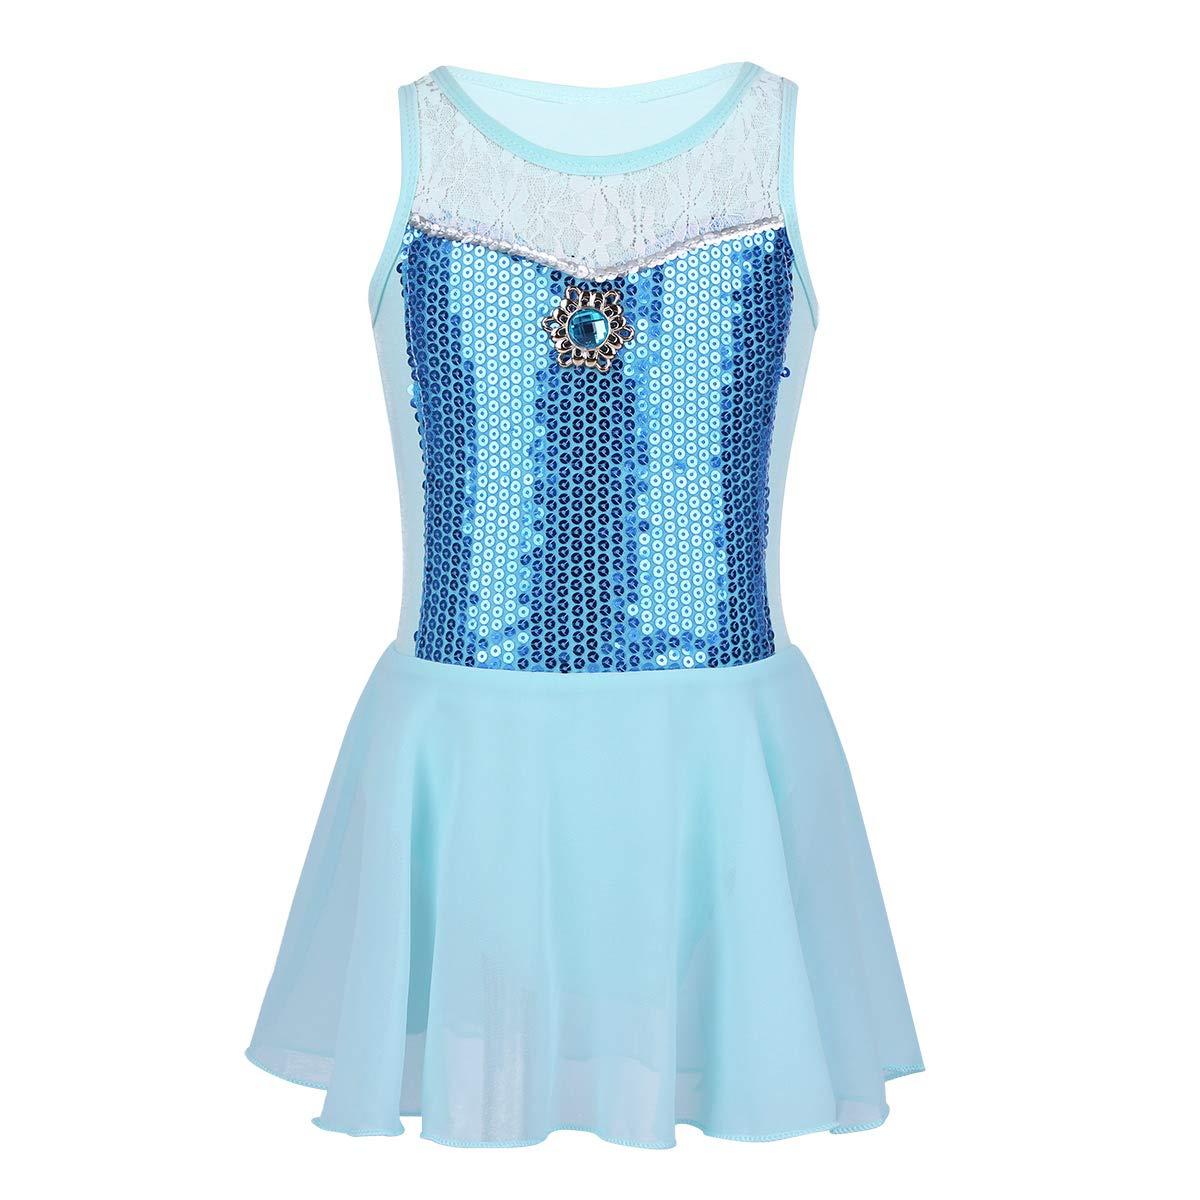 YOOJIA DRESS ガールズ B07LBLRPS8  ブルー 43528